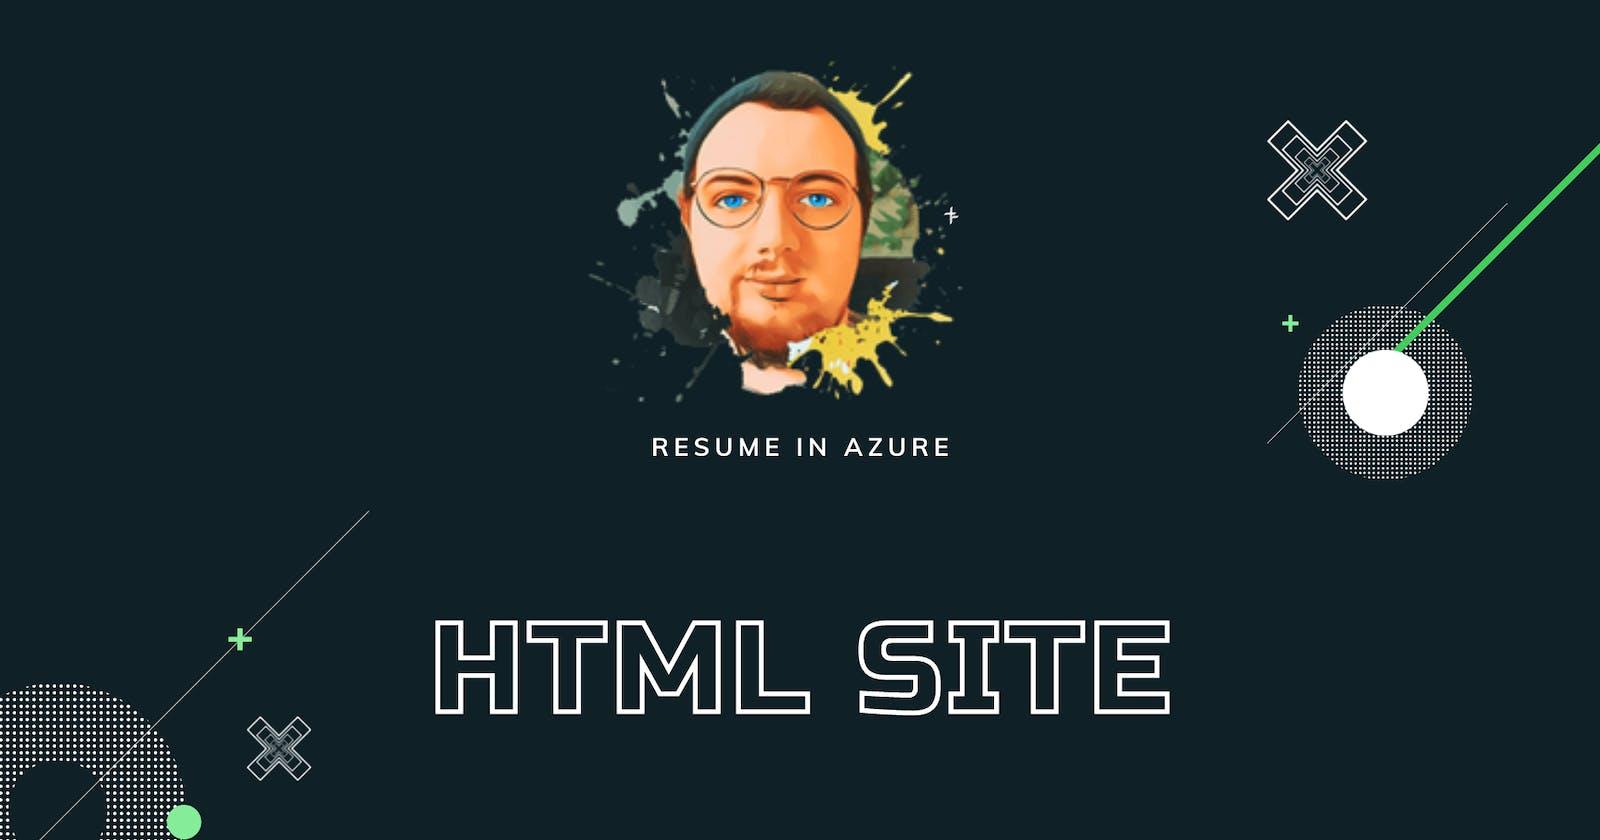 Resume in Azure #03: HTML Site